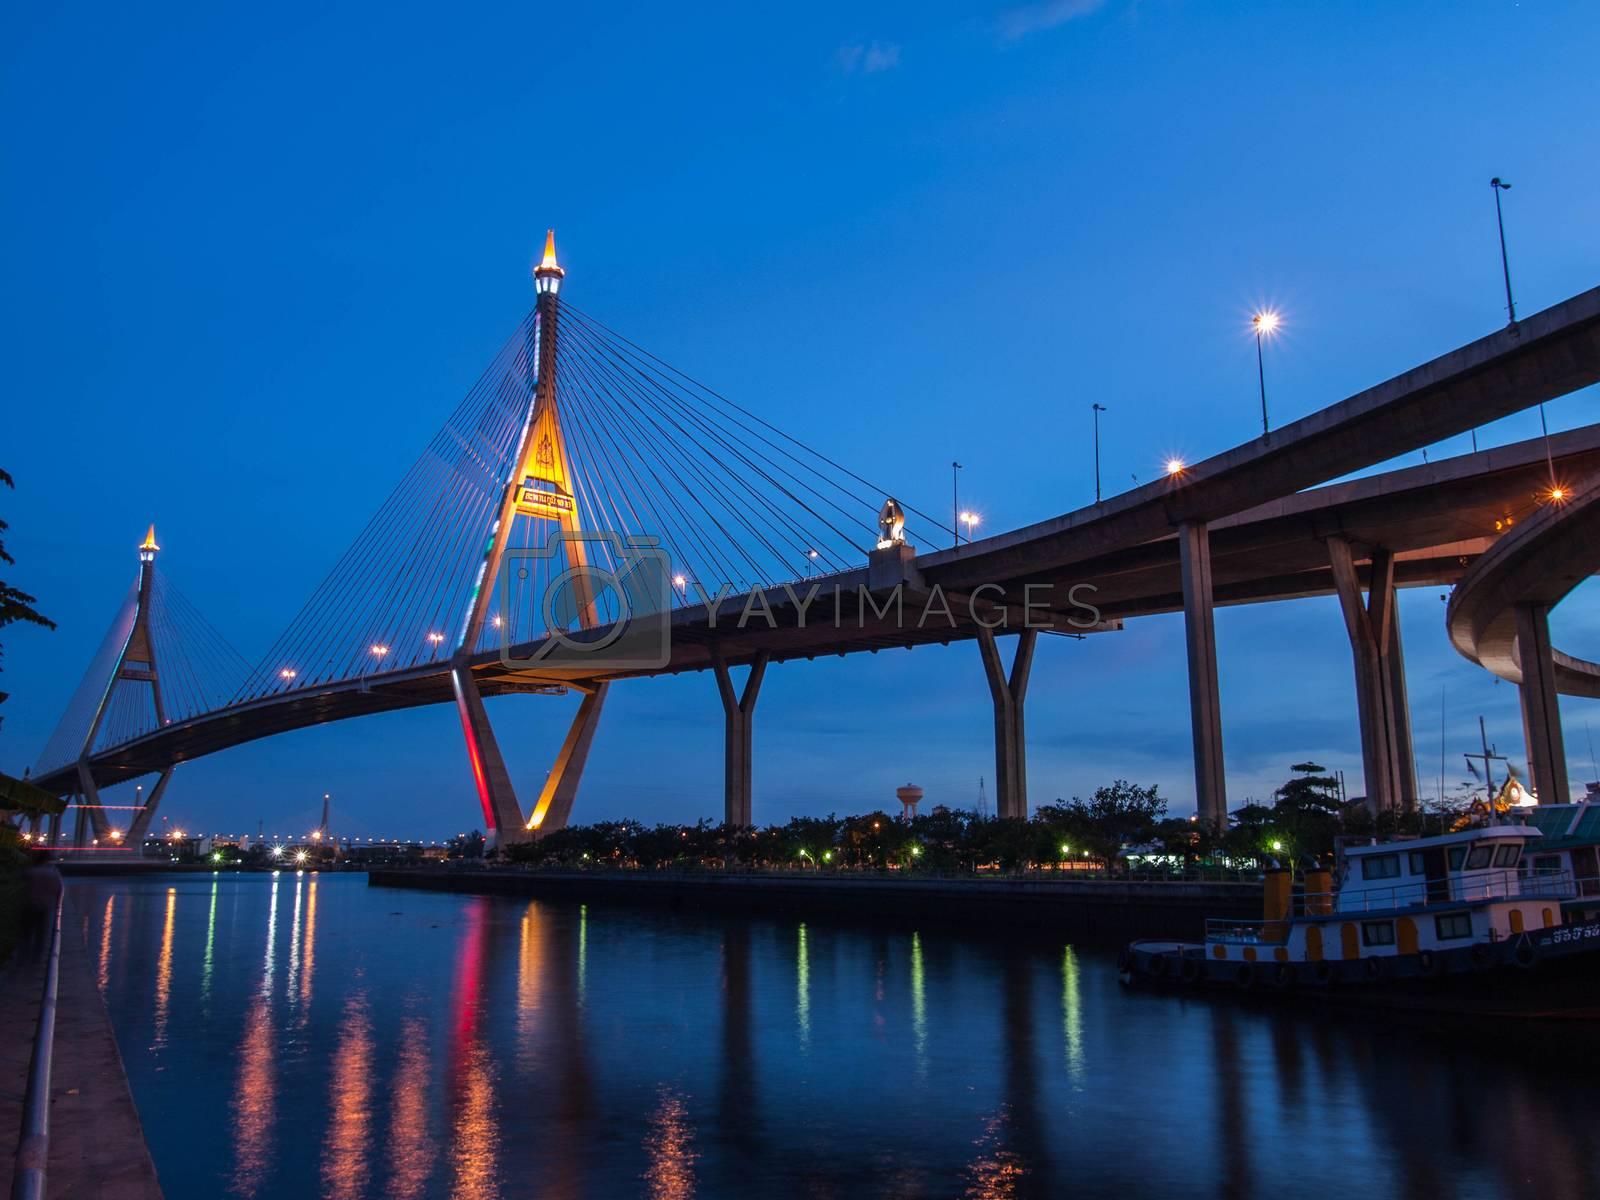 Bhumibol Bridge, The Industrial Ring Road Bridge in Bangkok, Tha by jakgree